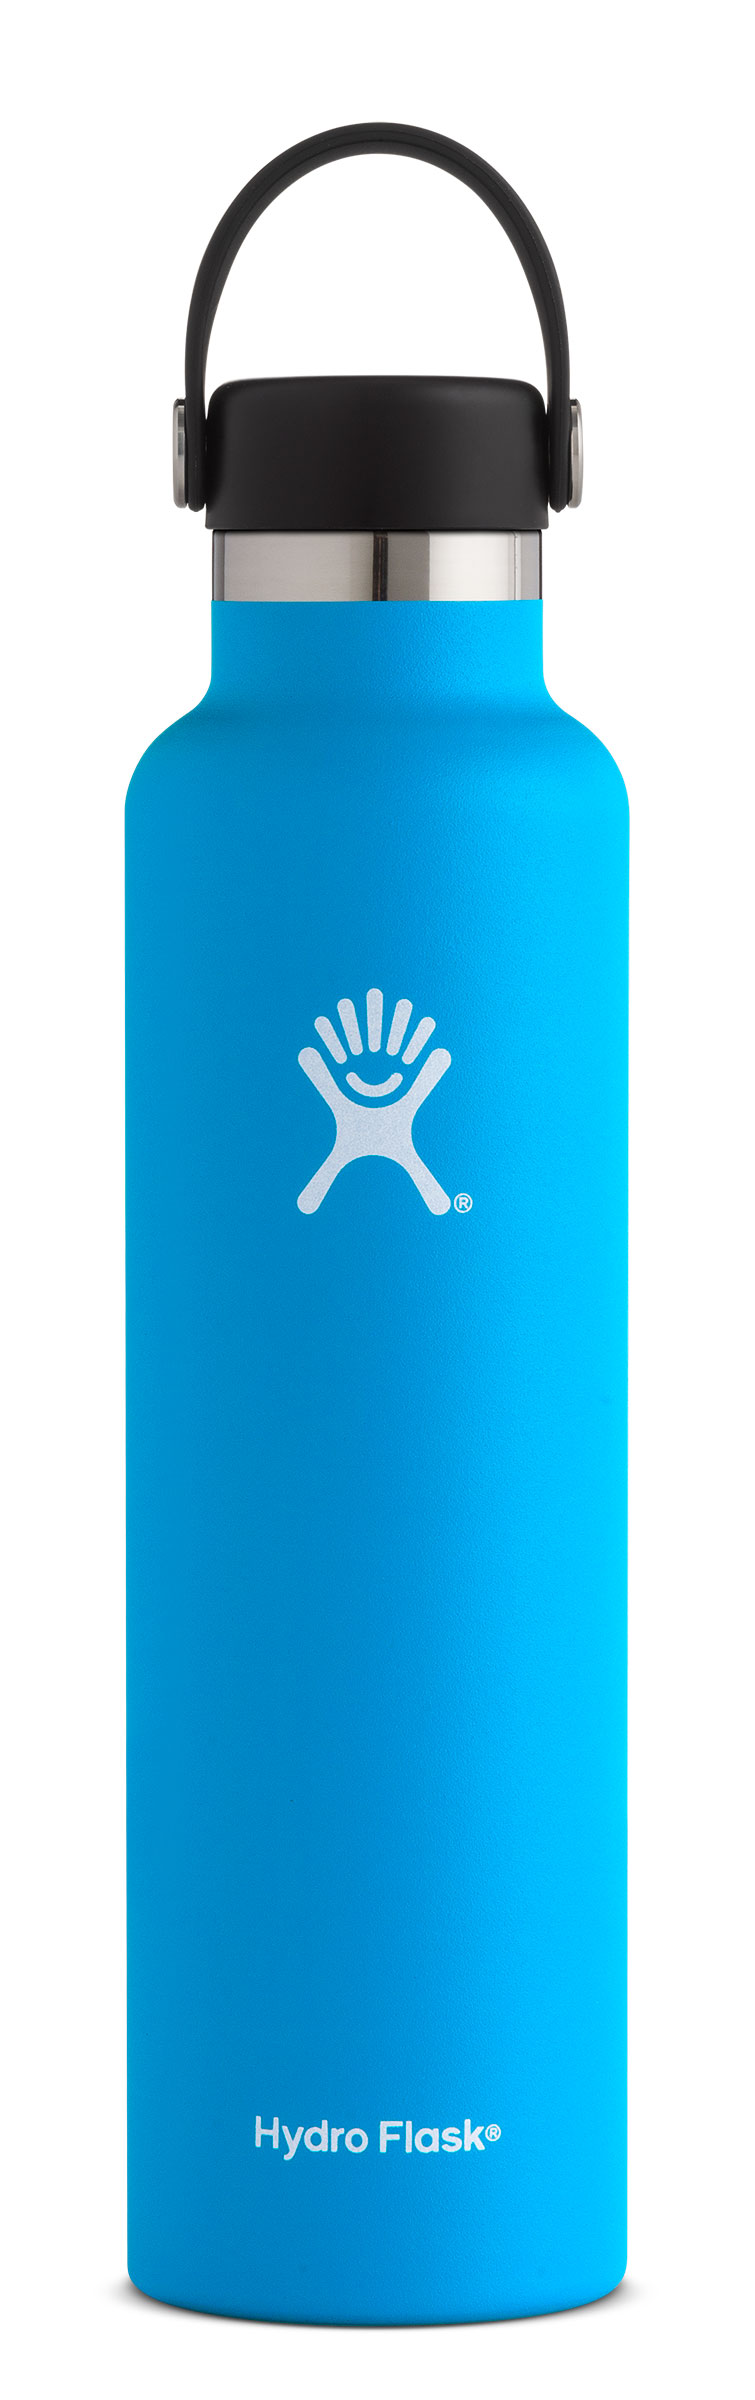 Hydro Flask S24SX, steklenica, modra